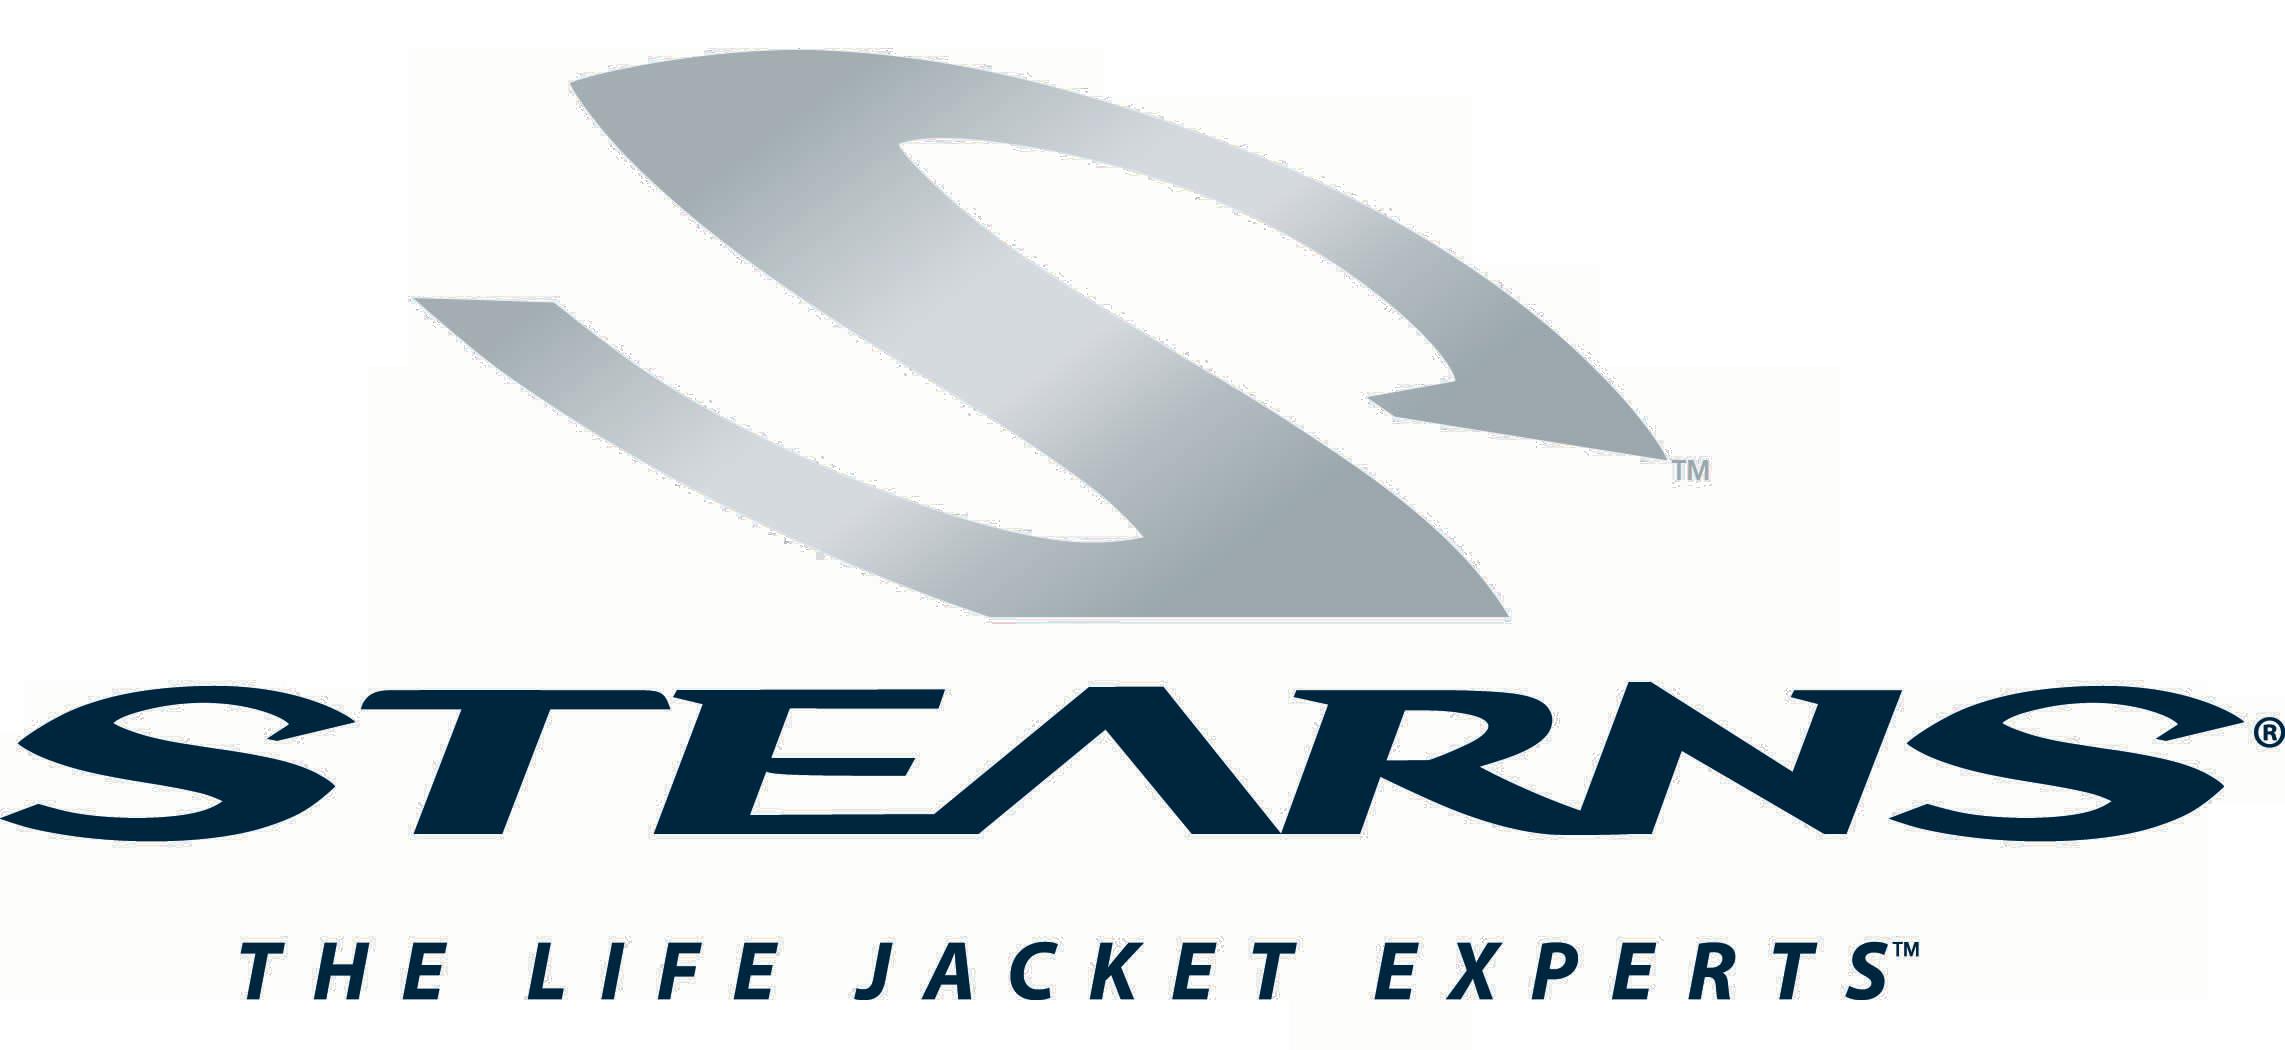 6_61_Stearns-Logo-Grey--Black.png